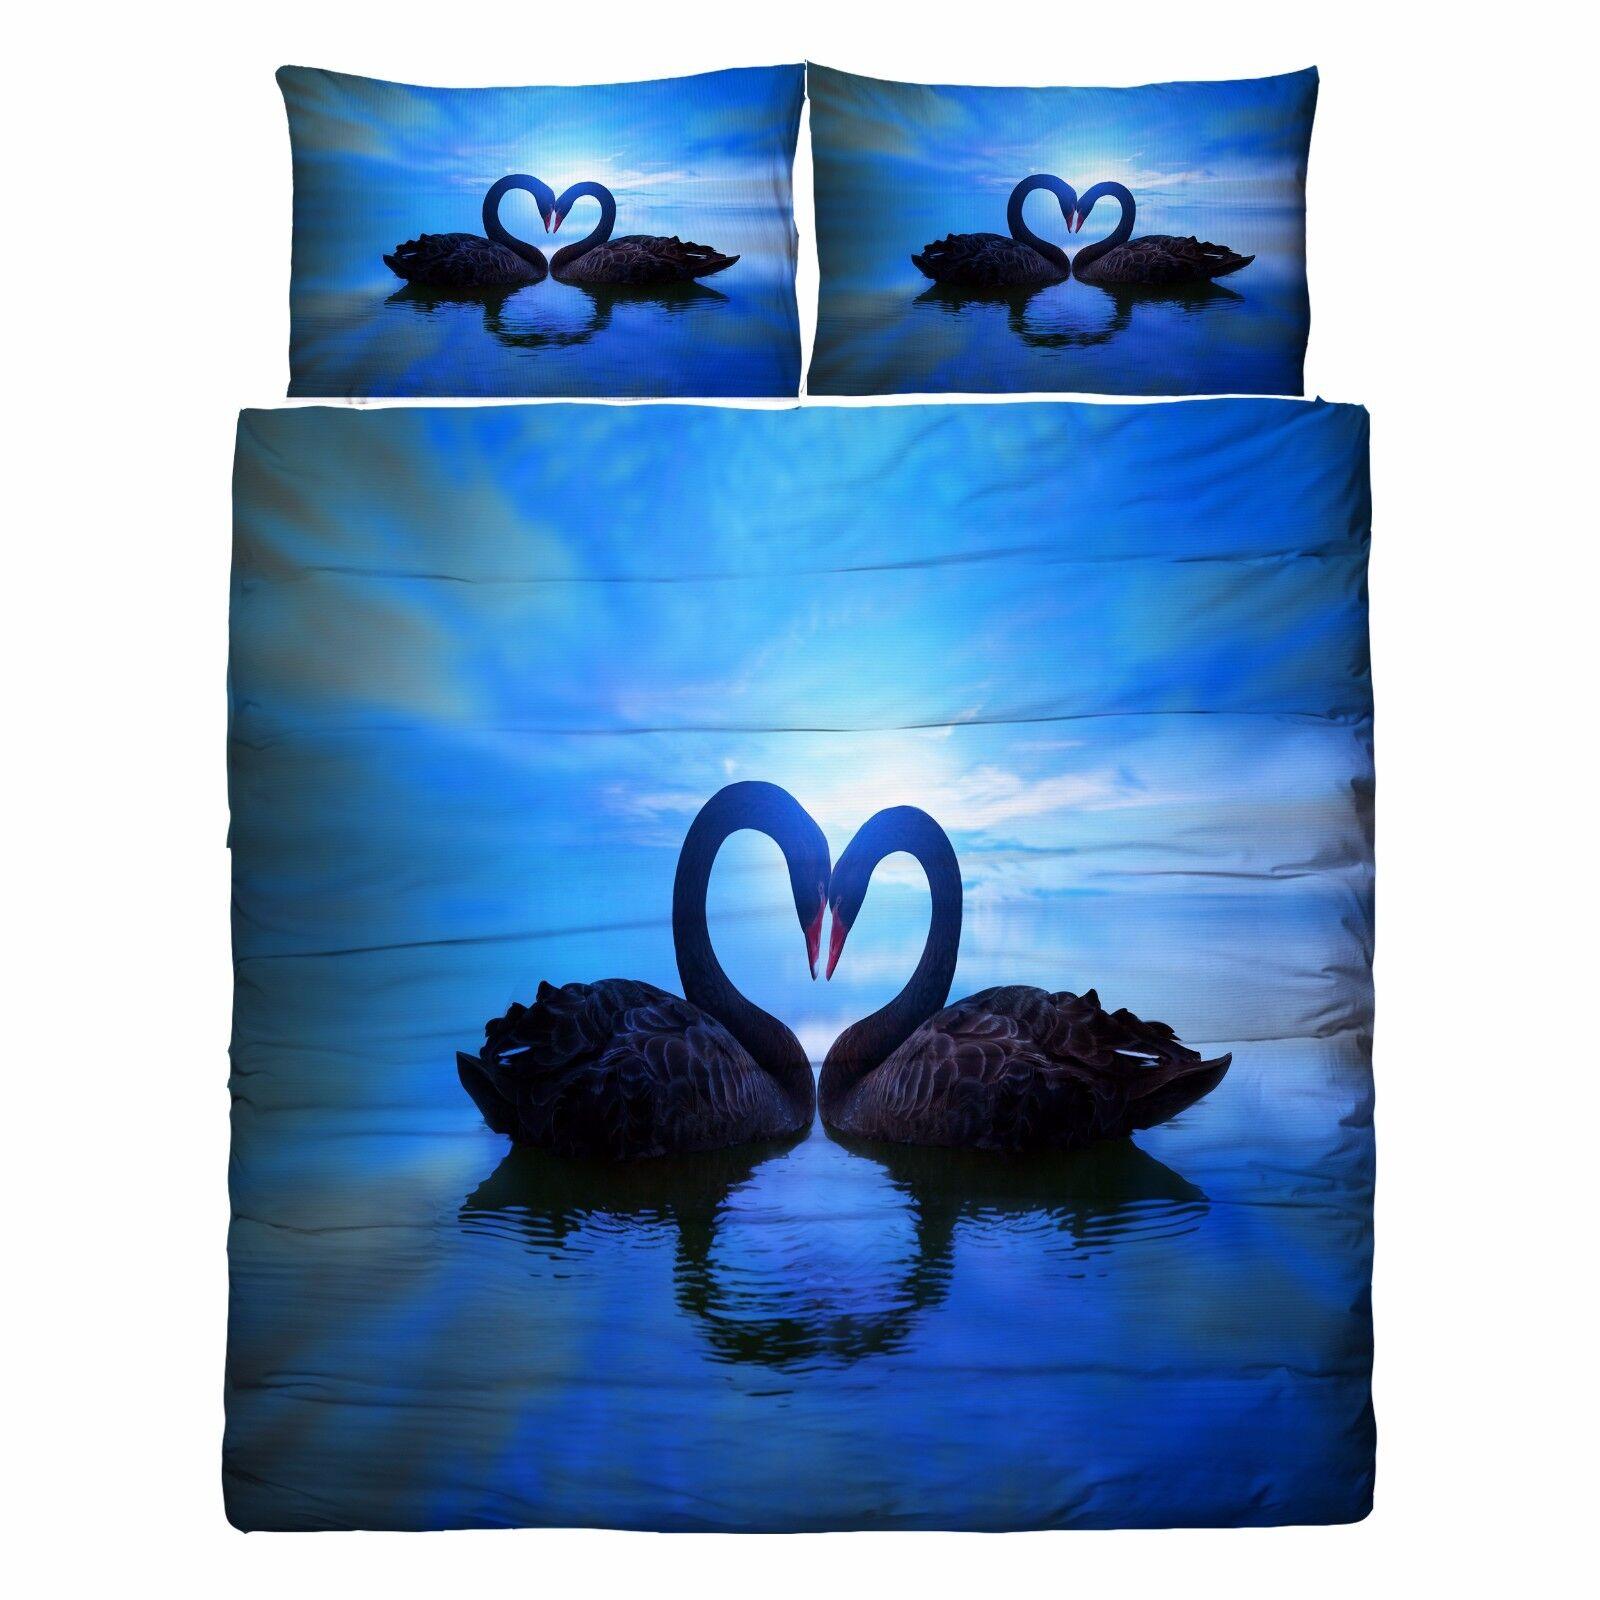 3D Sawn River 806 Bed Pillowcases Quilt Duvet Cover Set Single Queen UK Kyra